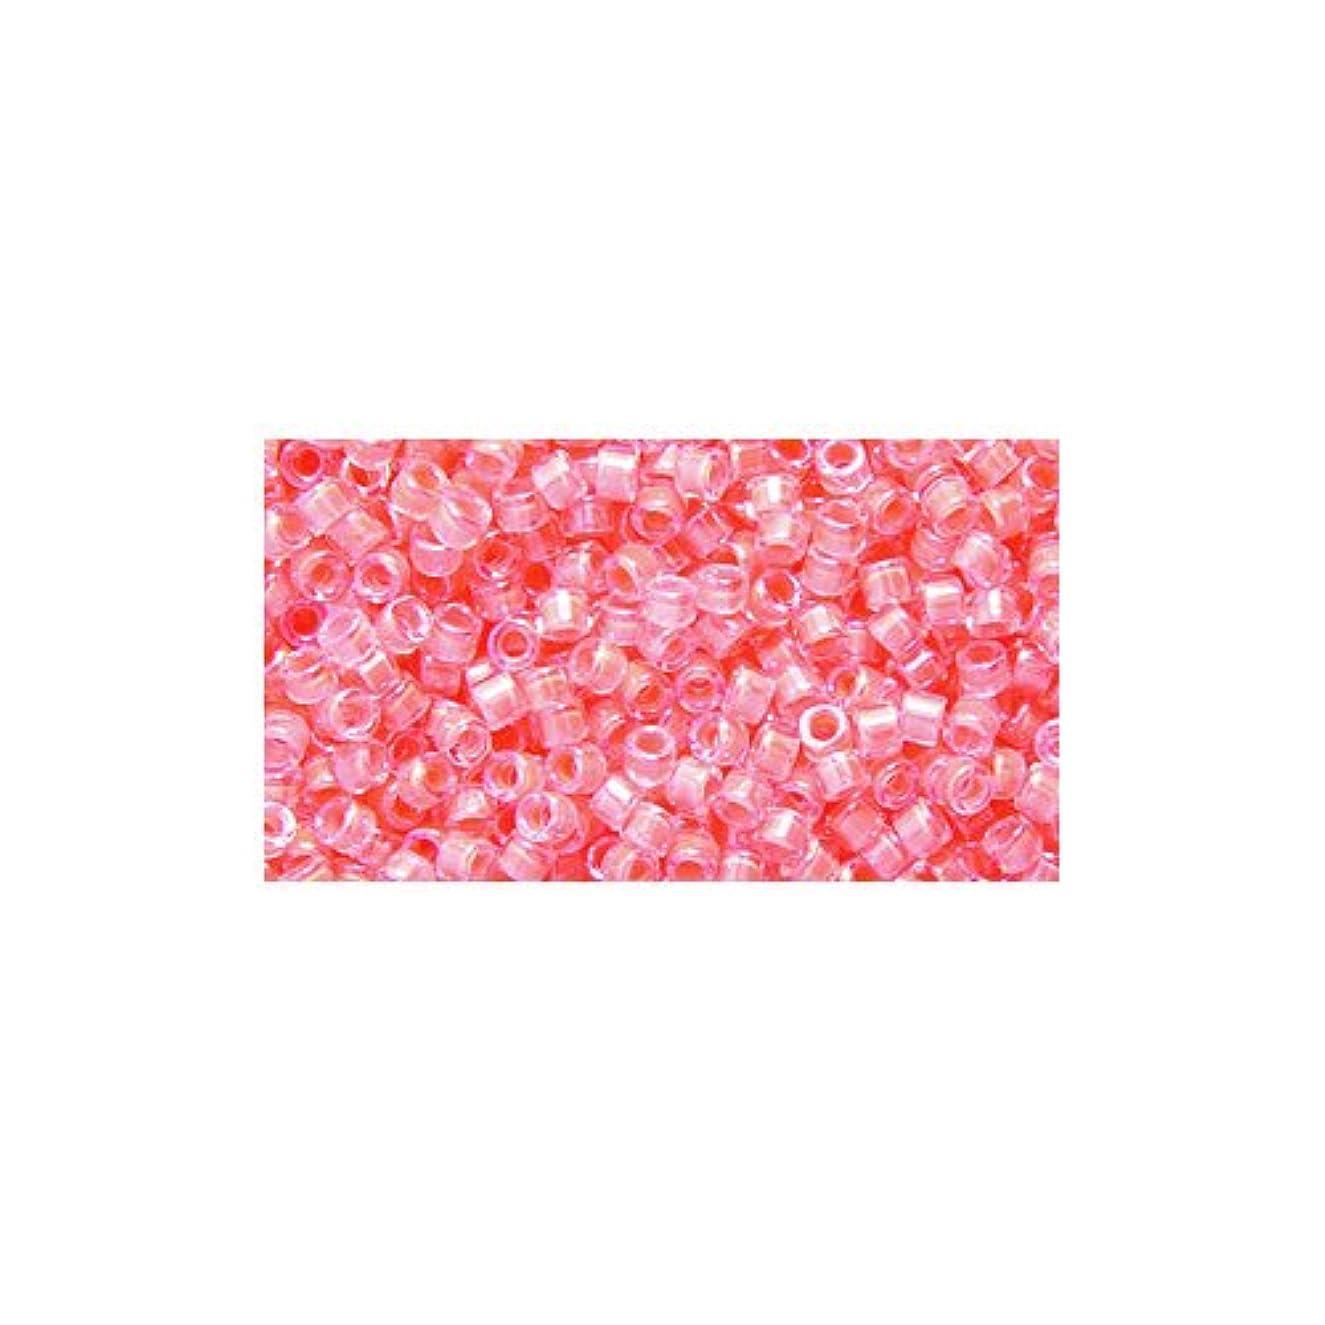 Miyuki Delica Seed Bead 11/0 DB2034, Luminous Flamingo, 9-Gram/Pack